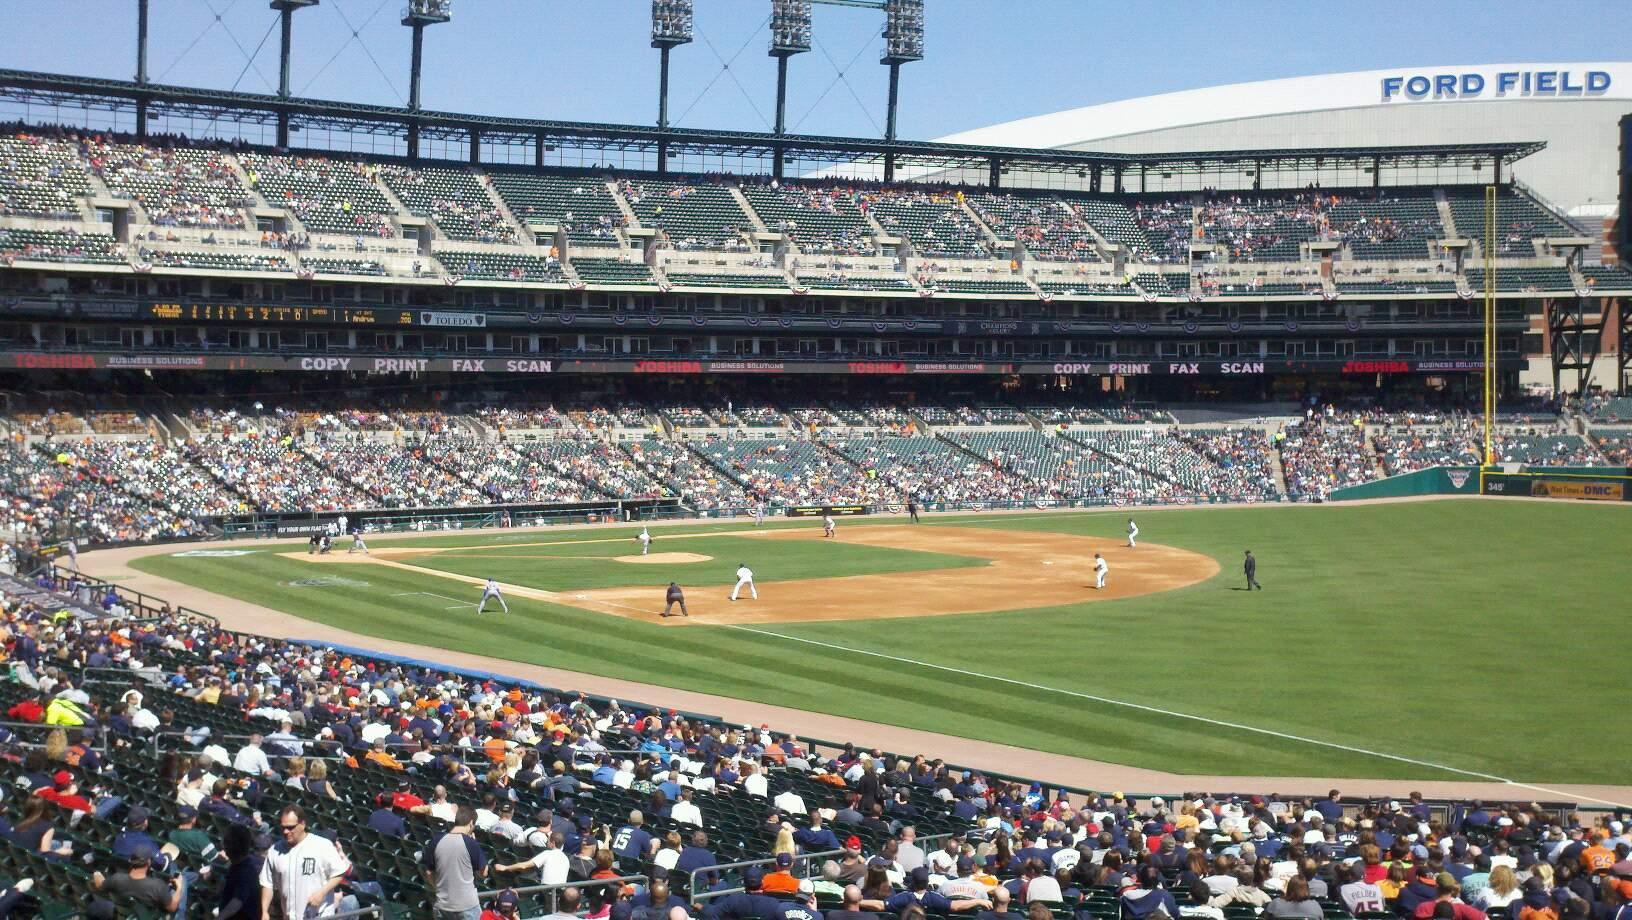 Detroit Tigers - Comerica Park Section 114 - RateYourSeats.com